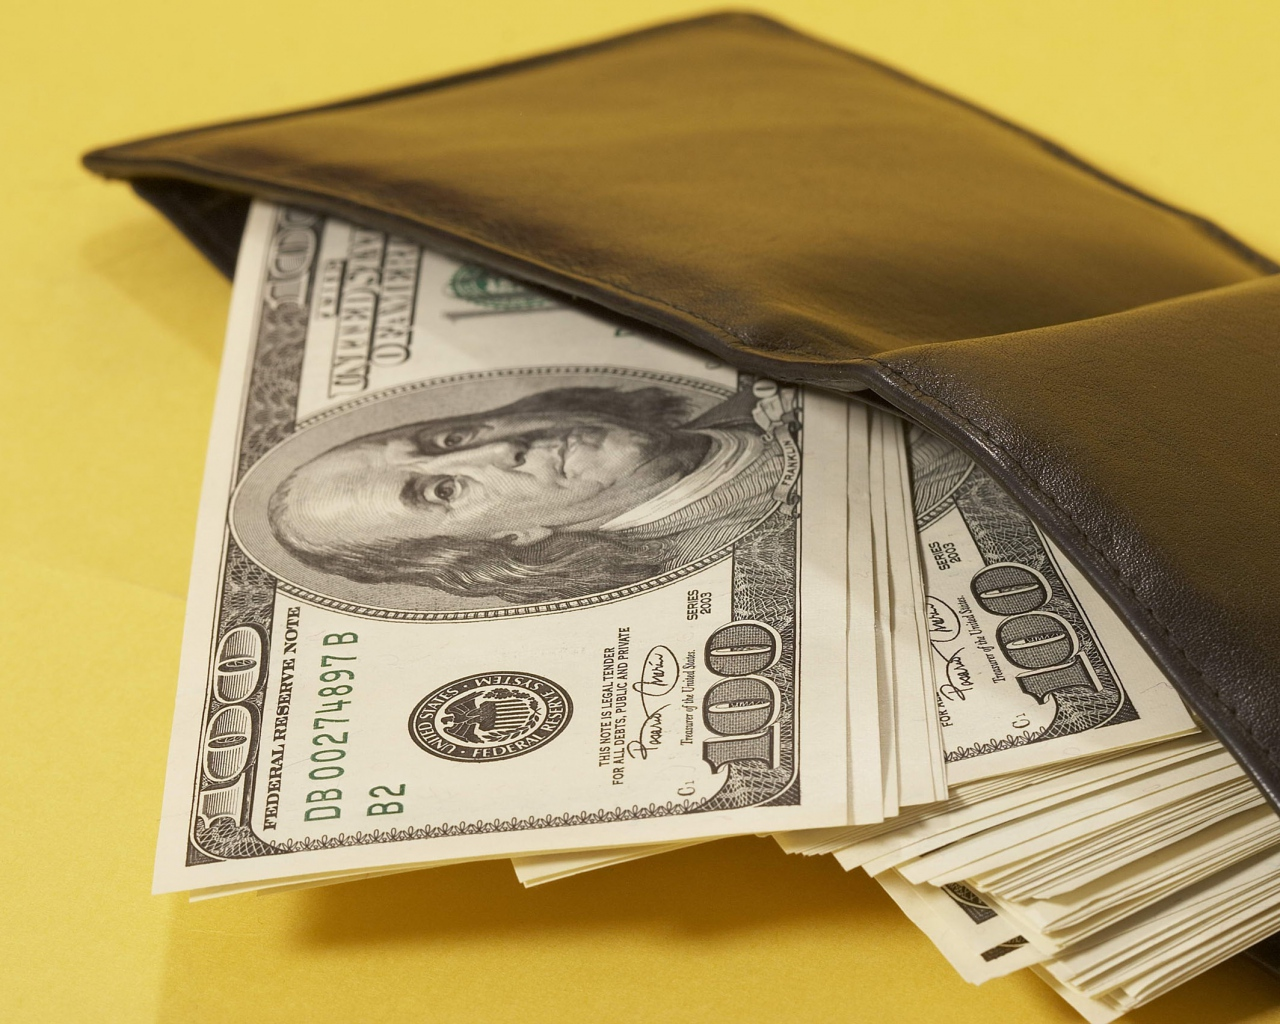 purses_money_dollars_bills_11150_1280x1024